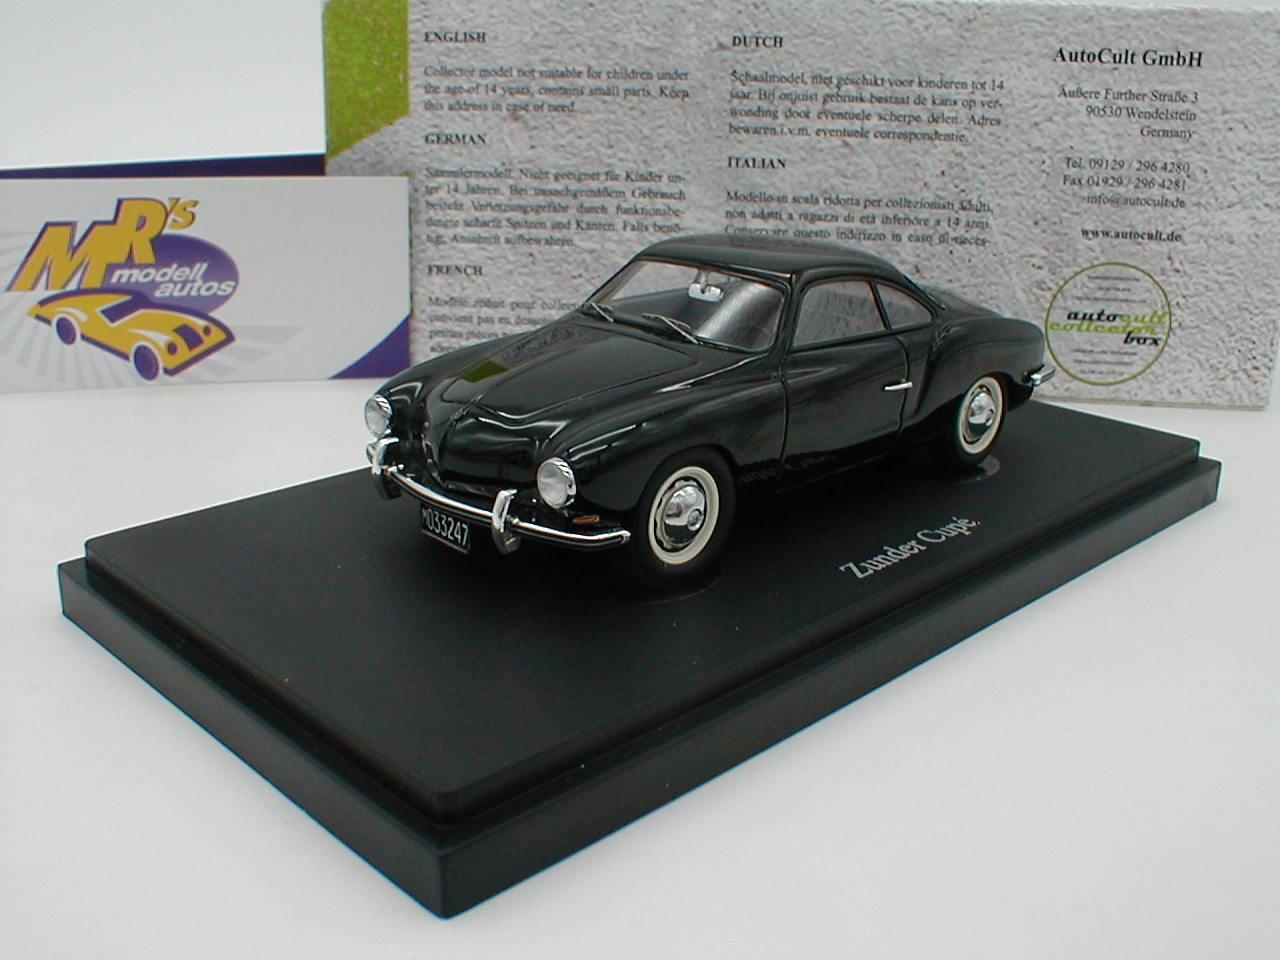 Autocult 05023-CasCocheillas cupe Coupe (Karman) año 1960  negros  1 43 novedad